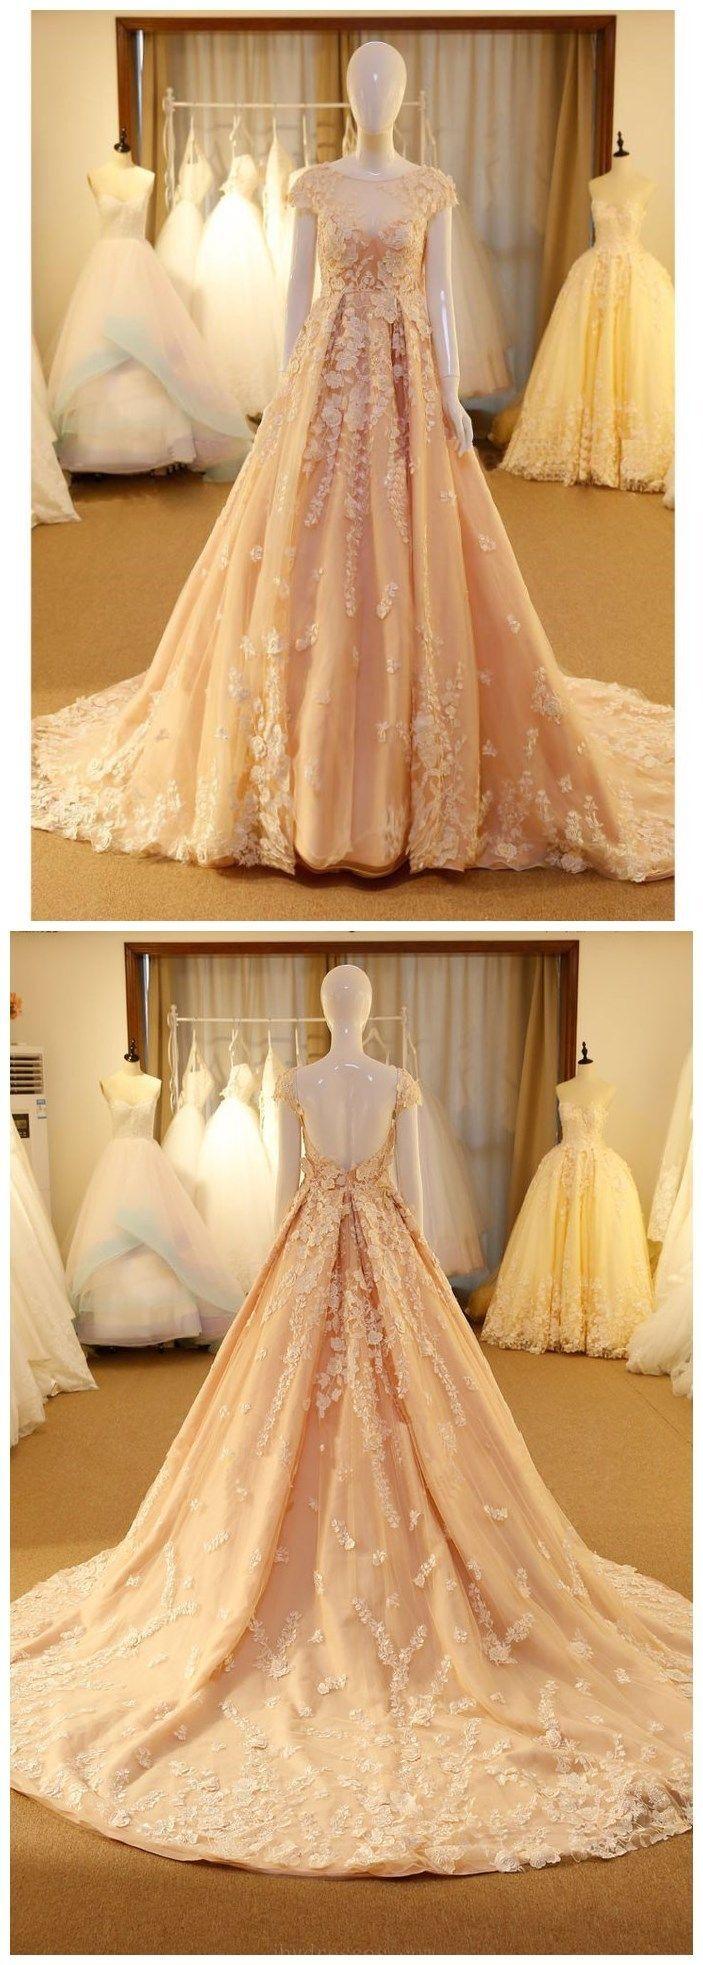 Custom made popular lace prom dresses prom dresses aline prom